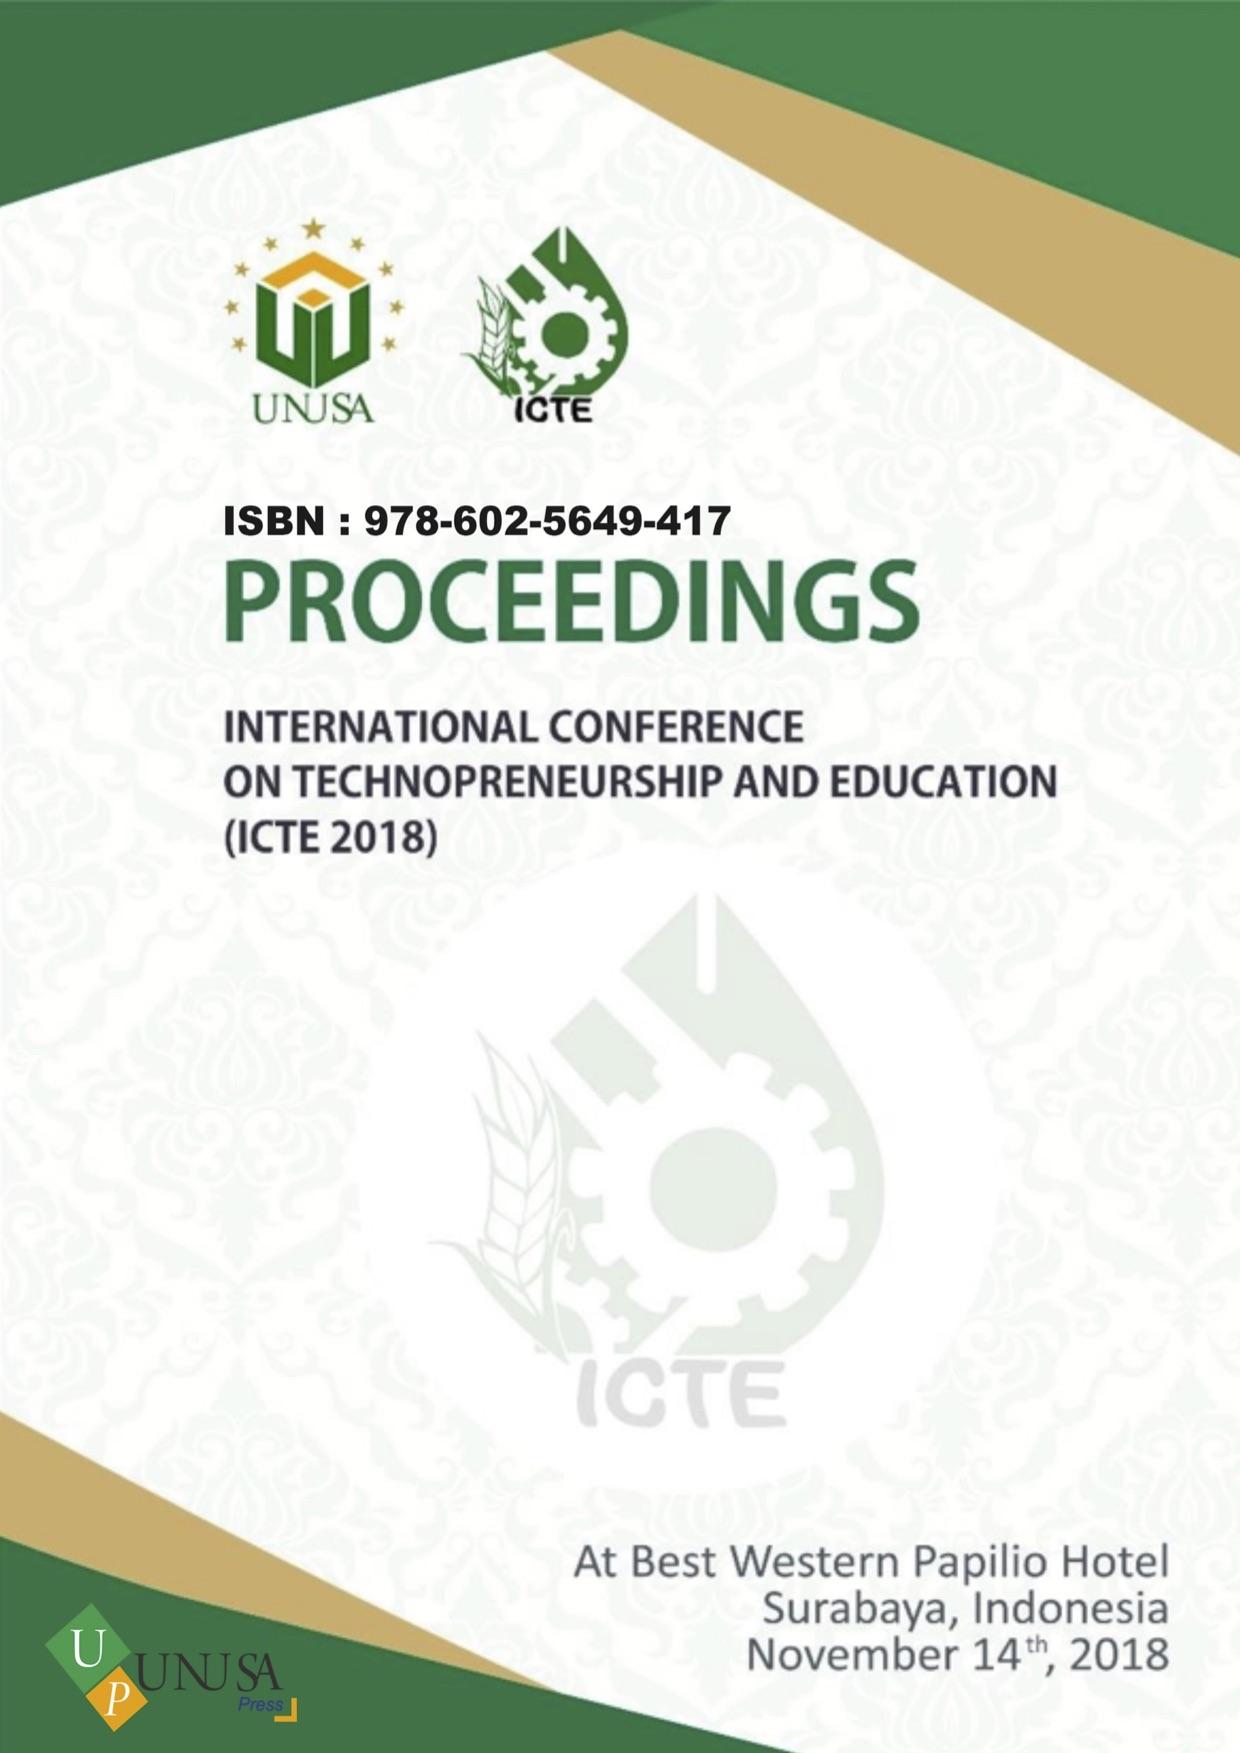 View Vol. 1 No. 1 (2018): PROCEEDING INTERNATIONAL CONFERENCE TECHNOPRENEUR AND EDUCATION 2018 - ICTE 2018